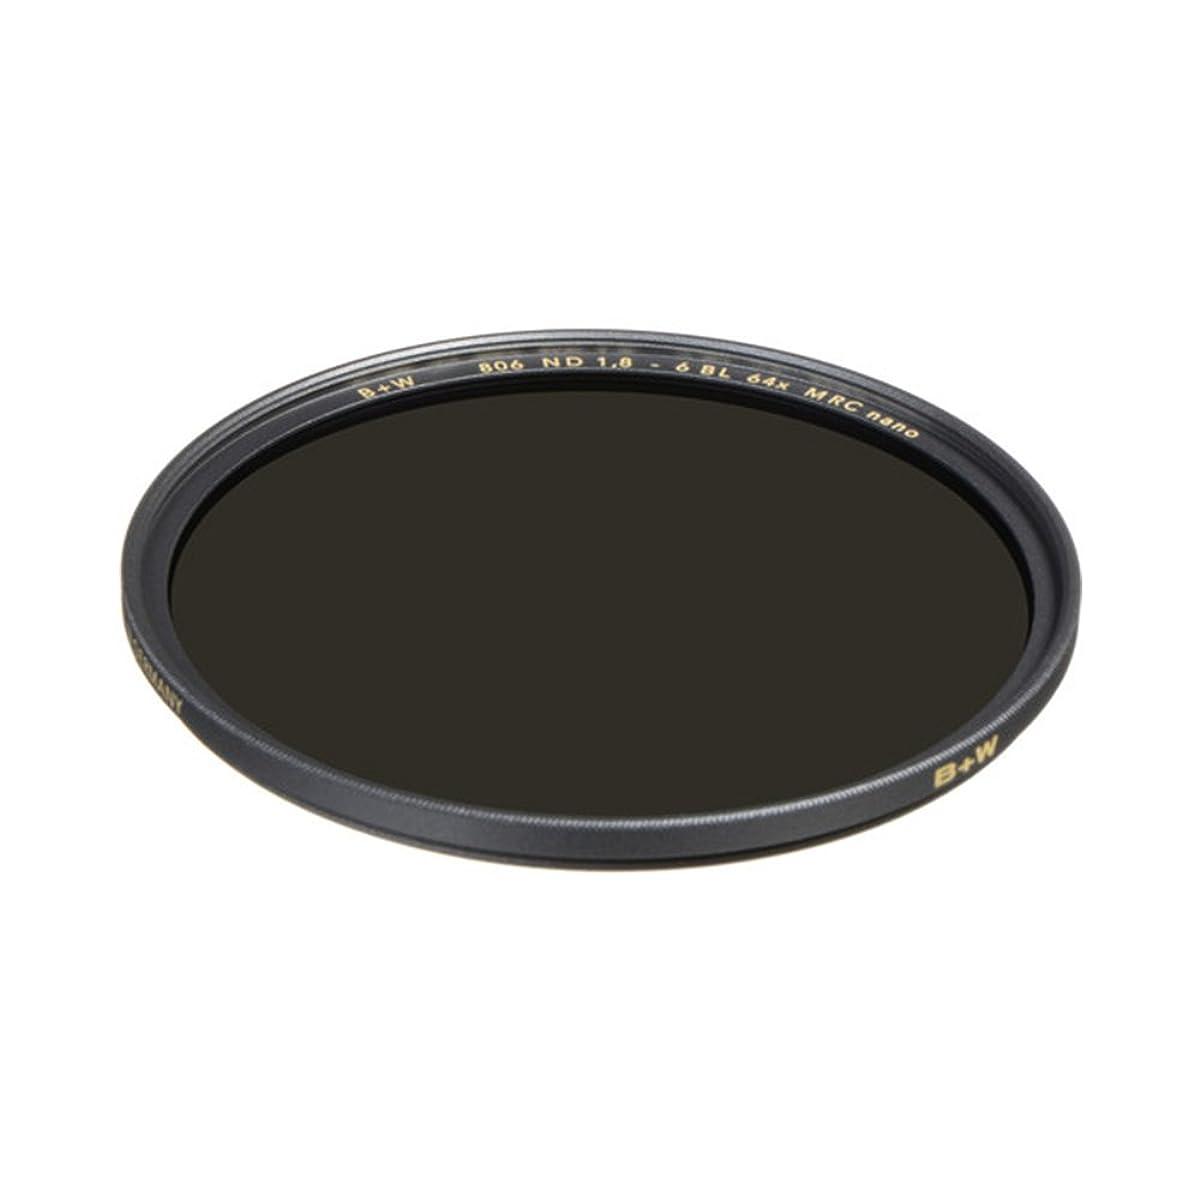 B+W 82mm 1.8-64X Multi-Resistant Coating Nano Camera Lens Filter, Gray (66-1089231)